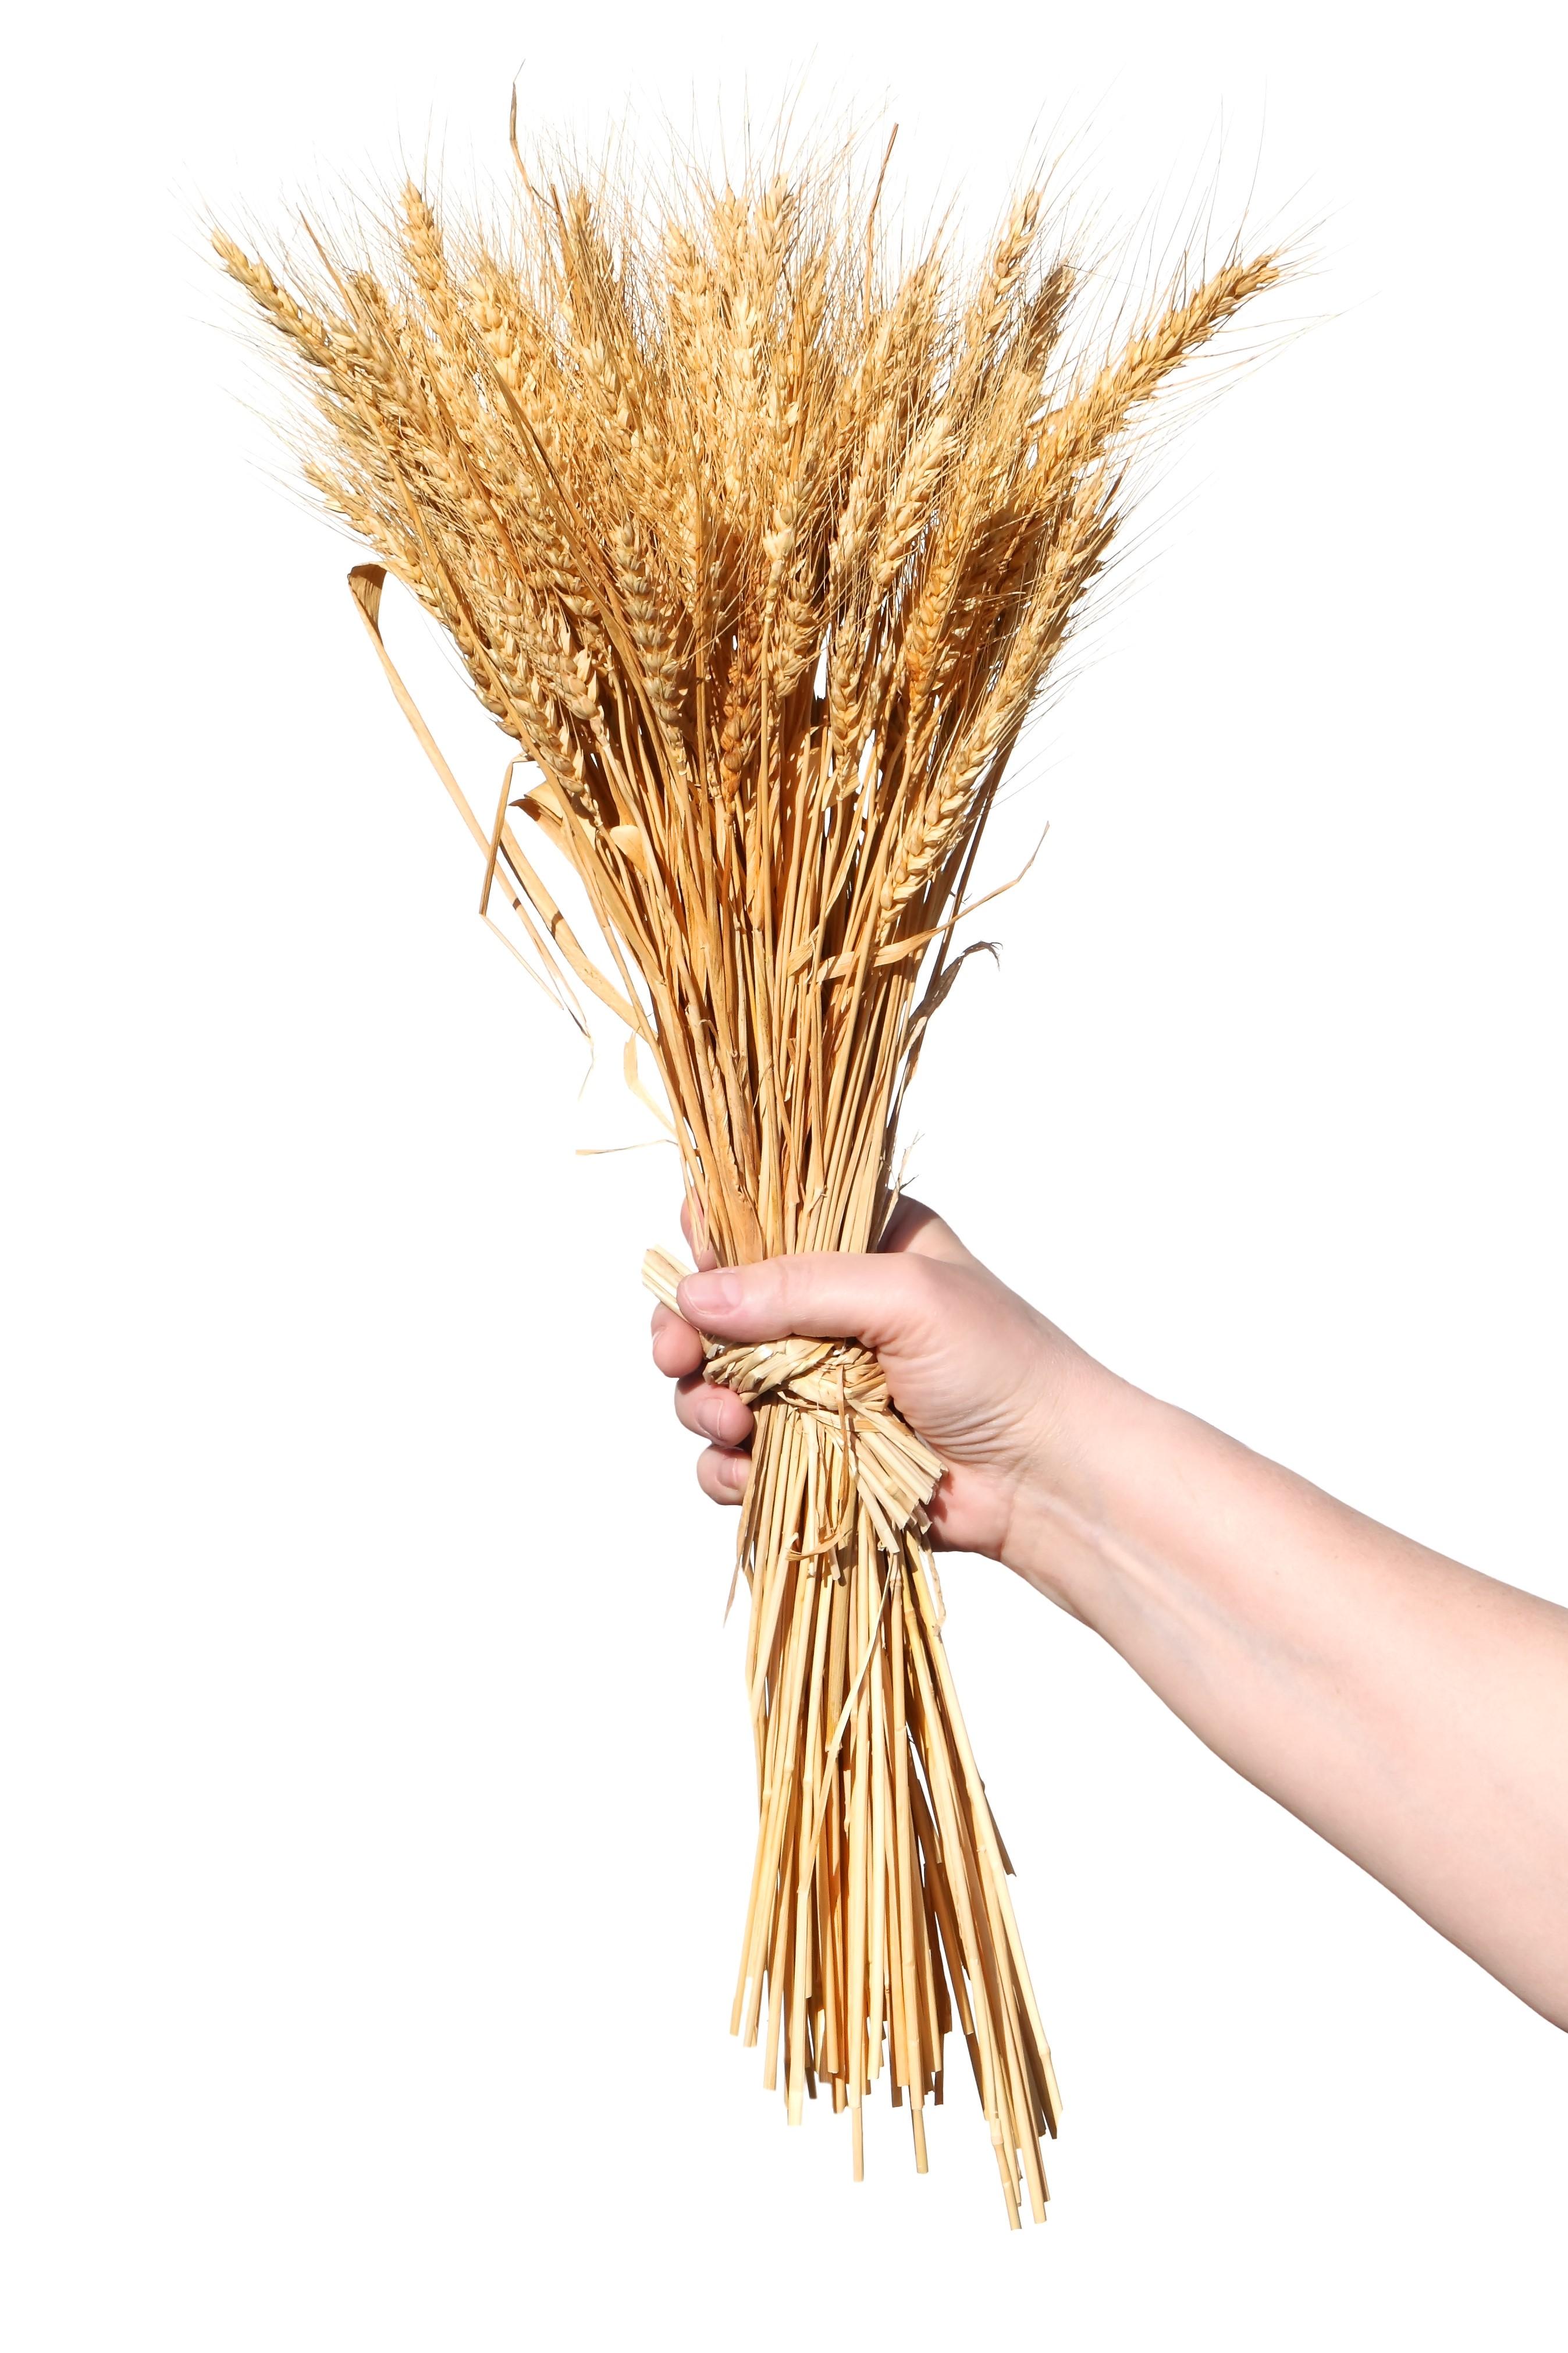 The seven species barley and wheat barley and wheat 2 buycottarizona Choice Image